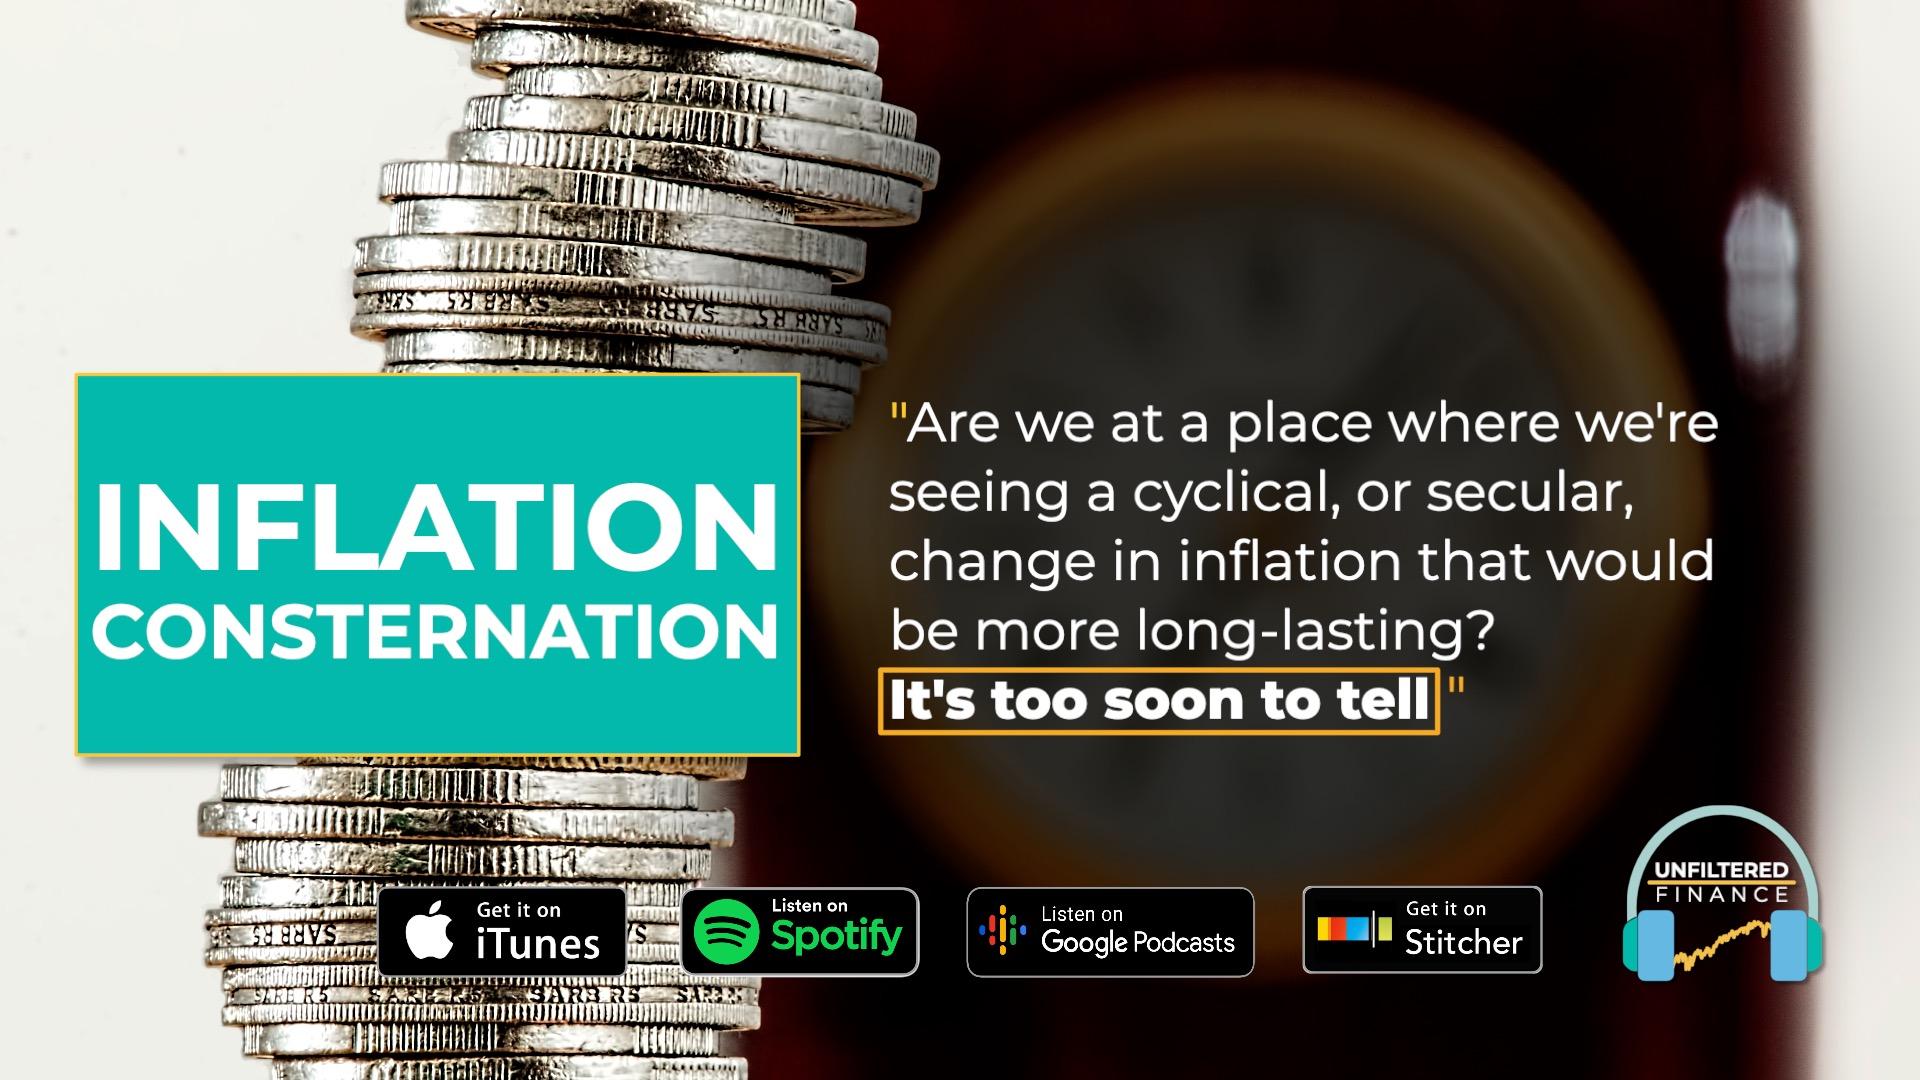 Inflation_Consternation-2